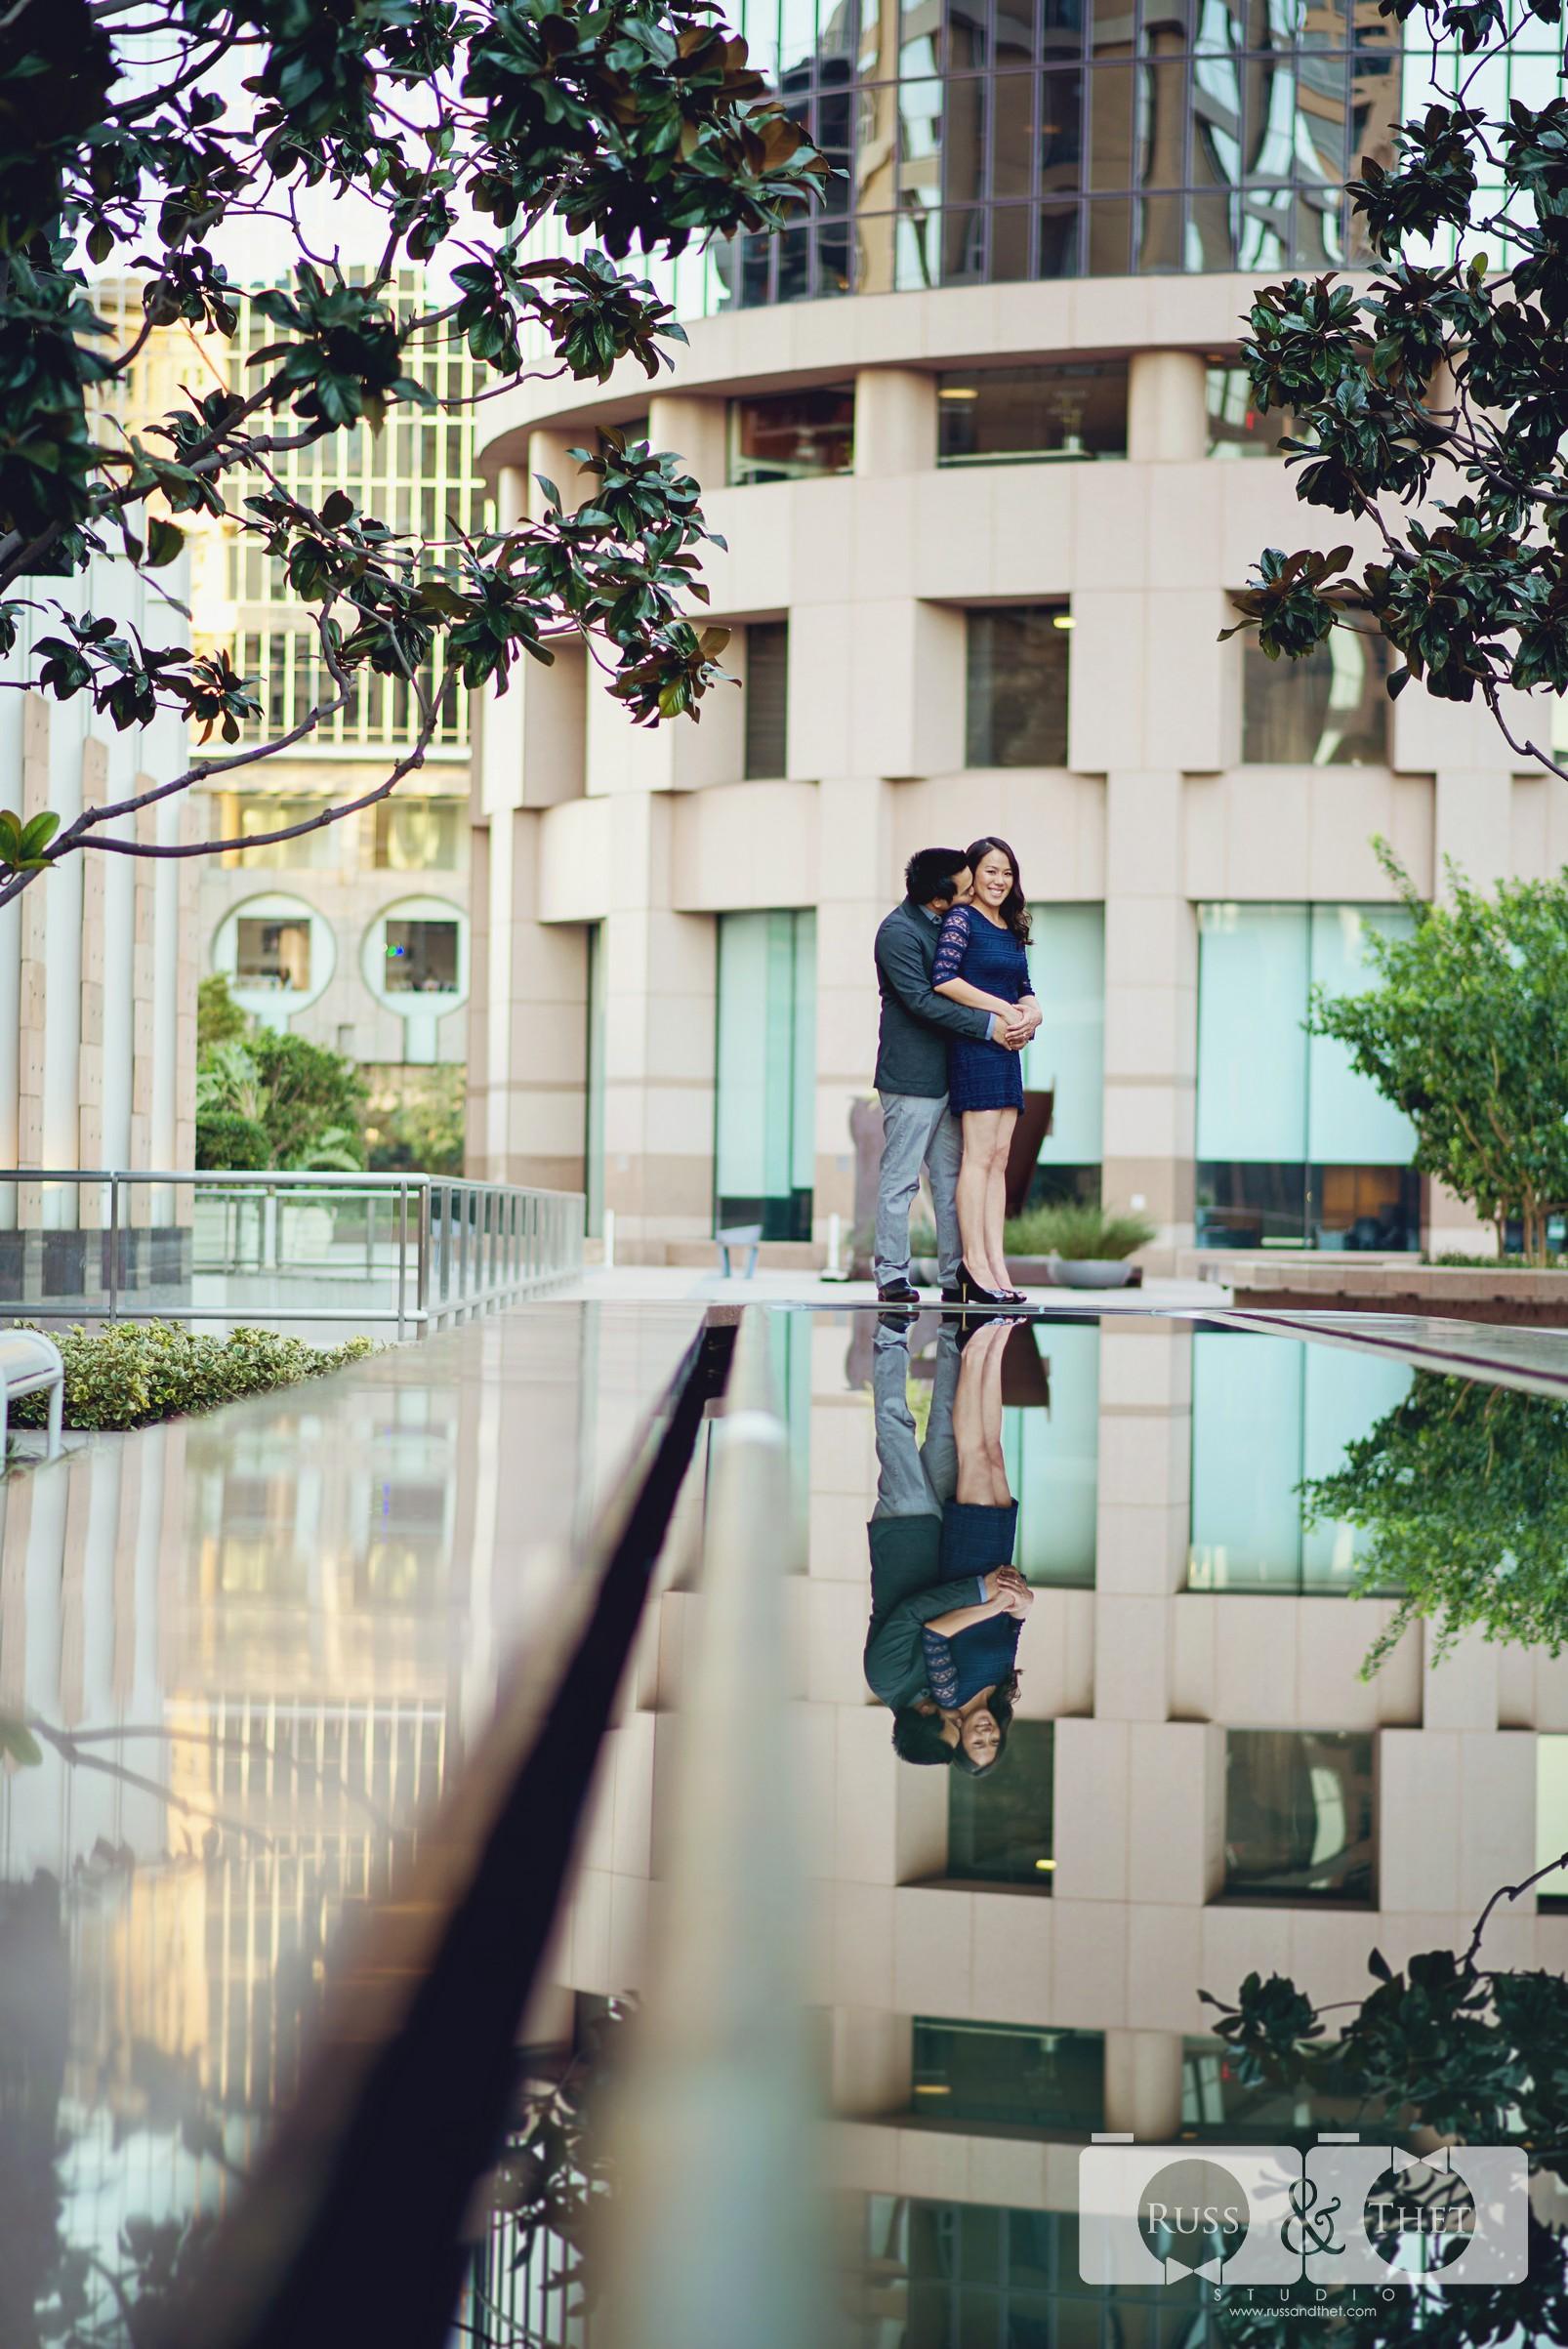 Emero_Lucinda_Downtown_Los_Angeles_Engagement_Photographer (15).jpg